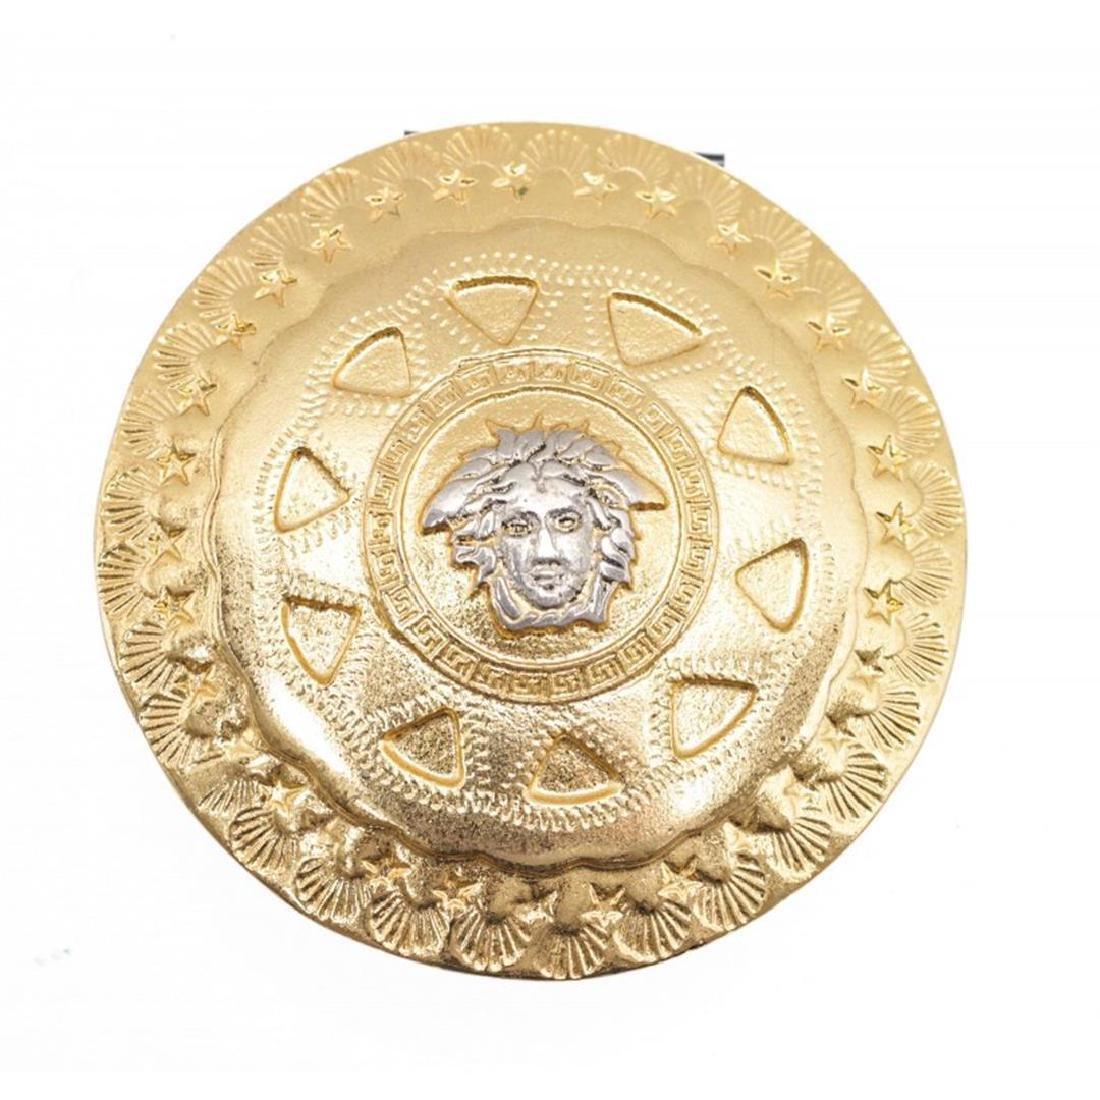 Gianni Versace Vintage Gold Medusa Hair Accessory Clip